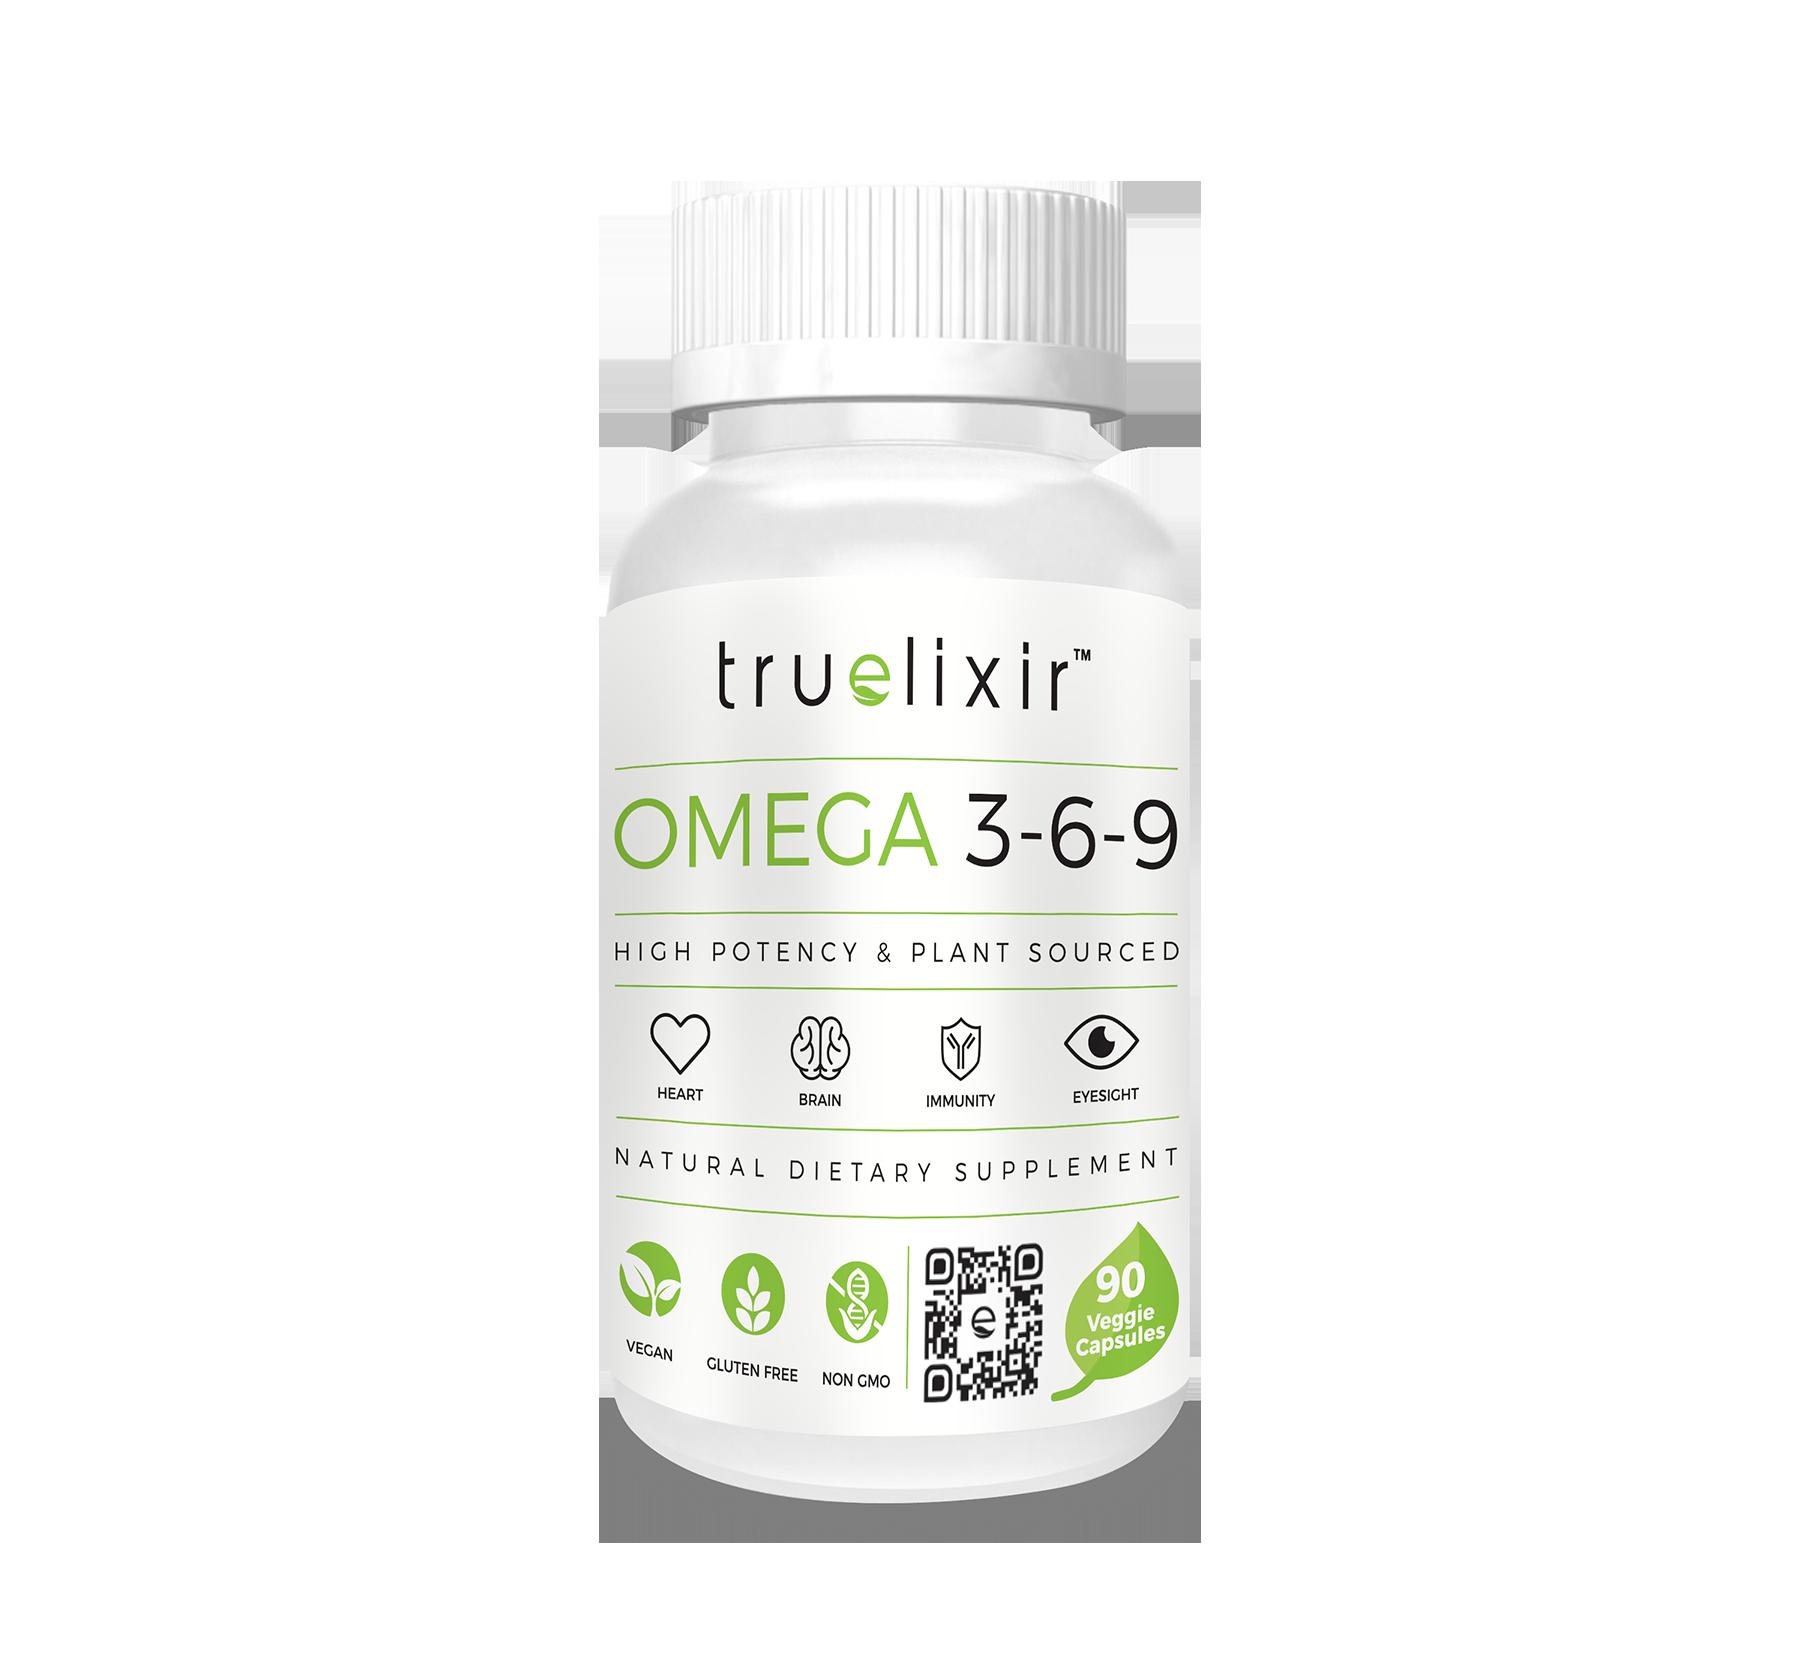 Vegan Omega 3 6 9 Ala La Oa Supplements Of Unsurpassed